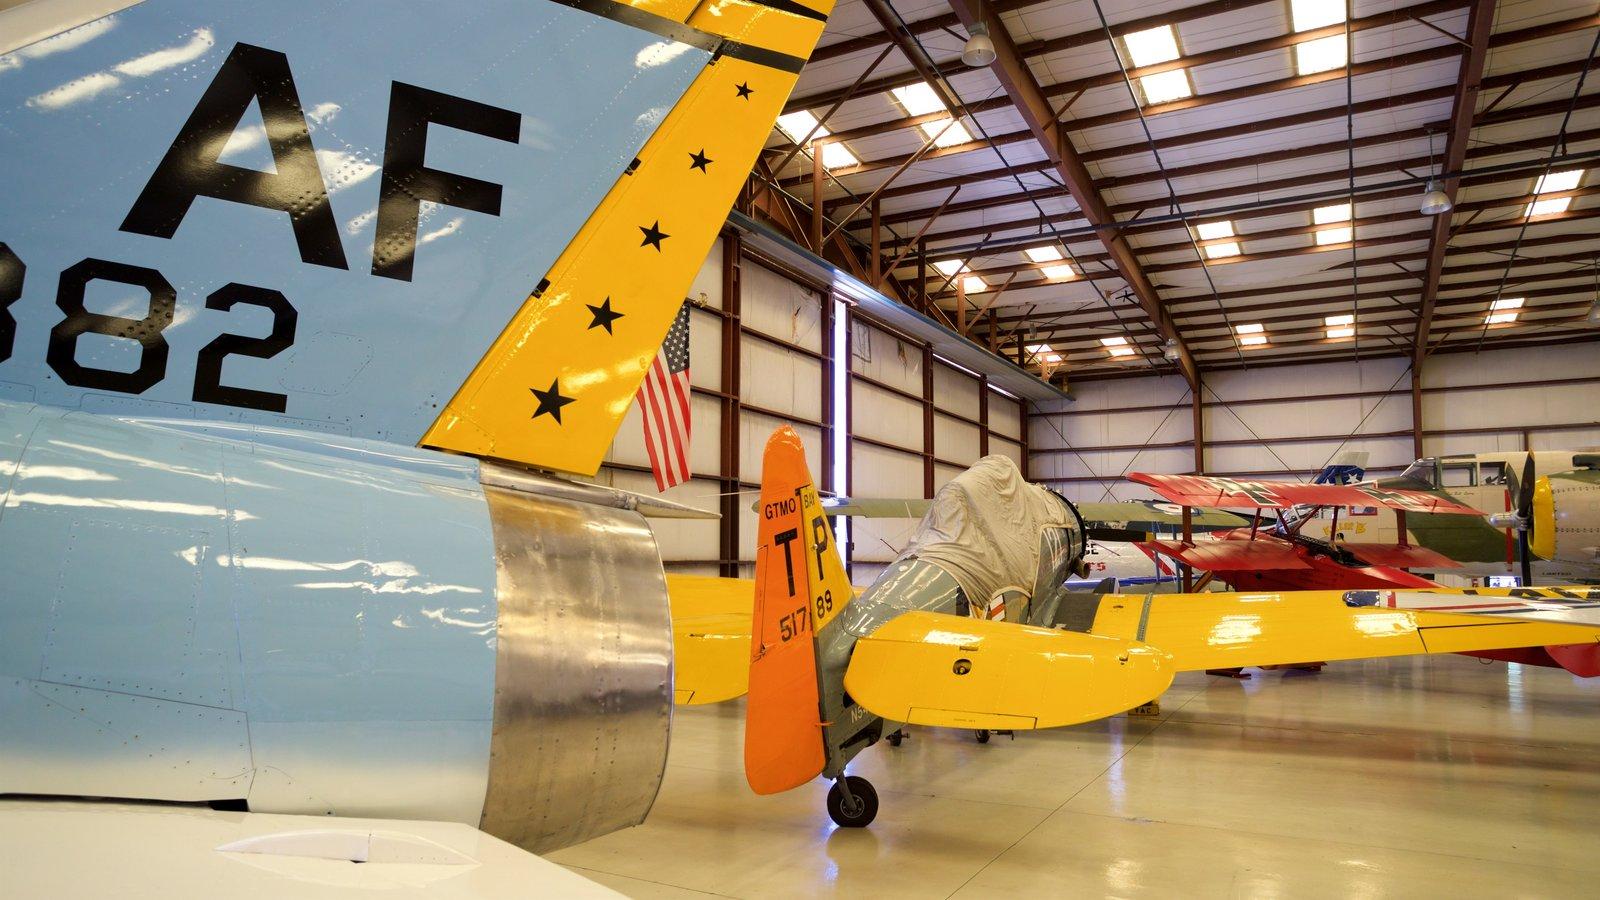 Valiant Air Command Warbird Museum featuring interior views